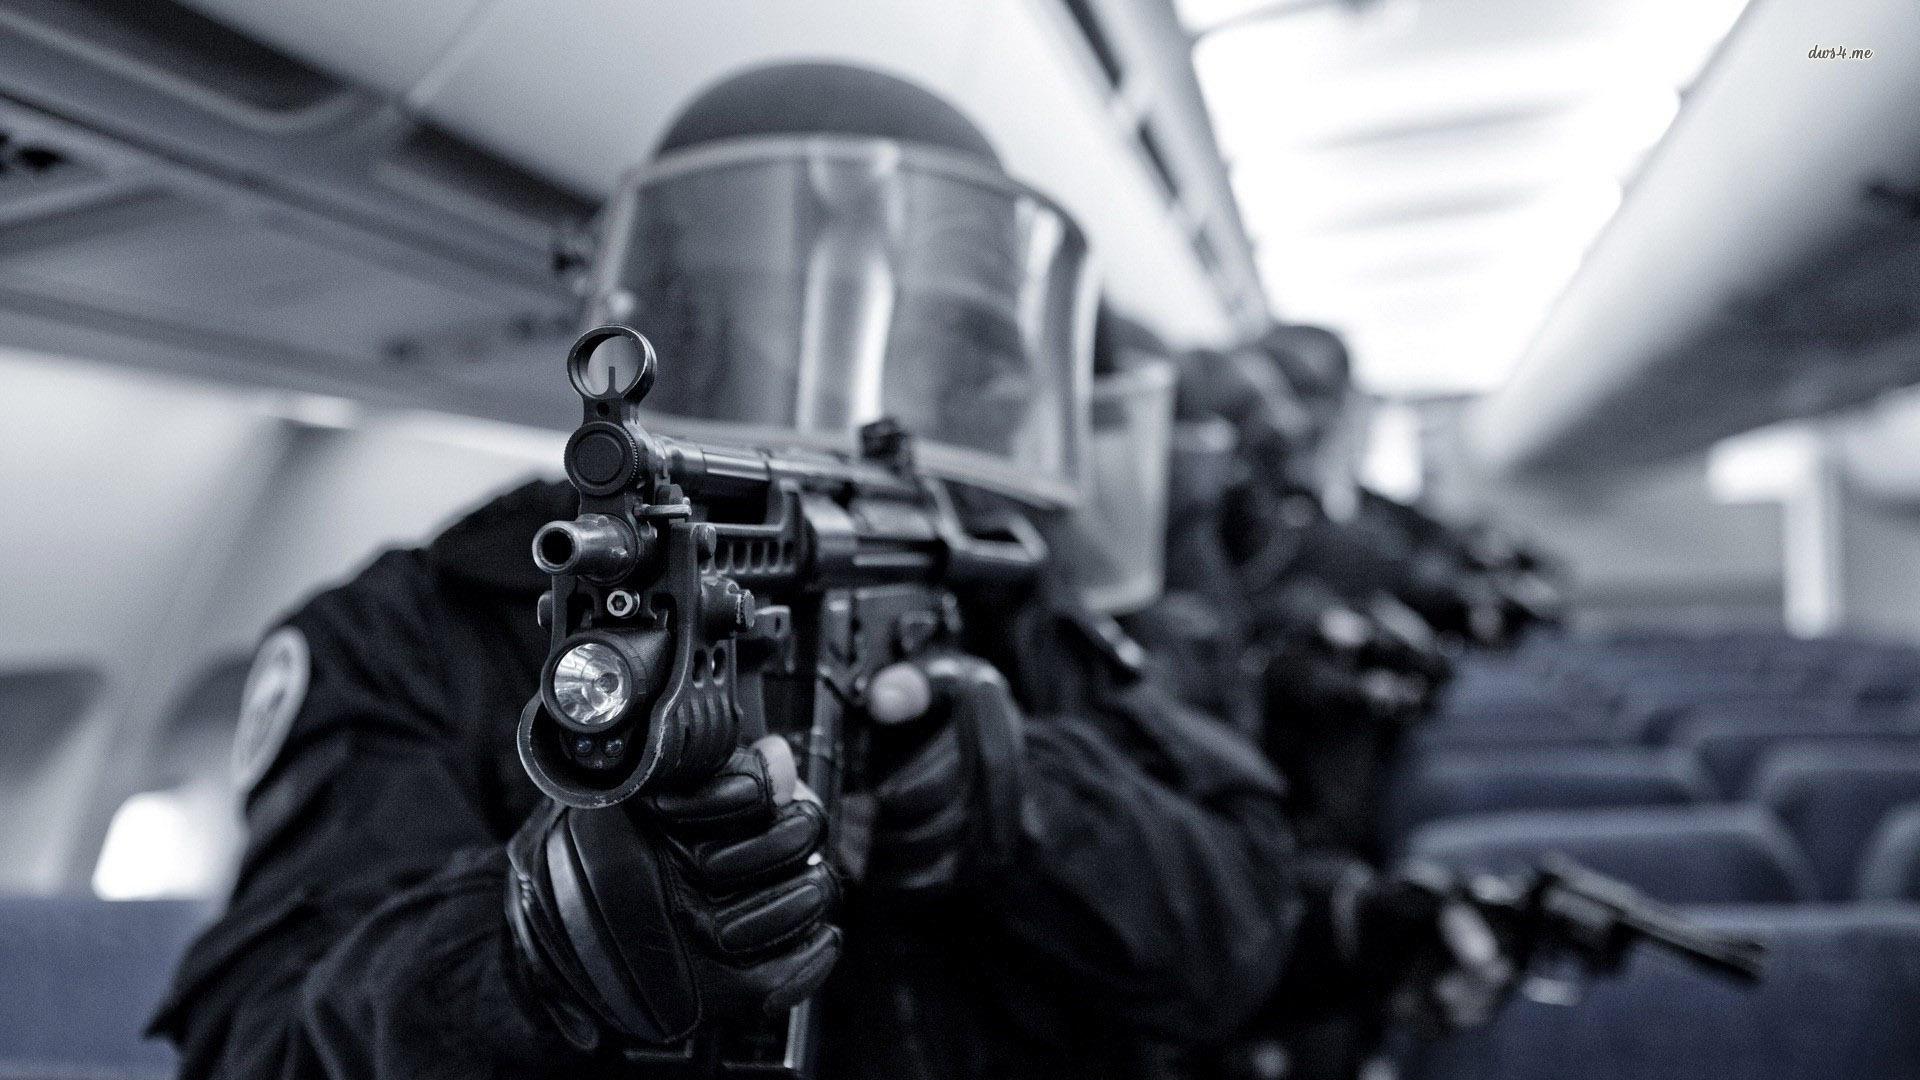 SWAT team wallpaper   972745 1920x1080